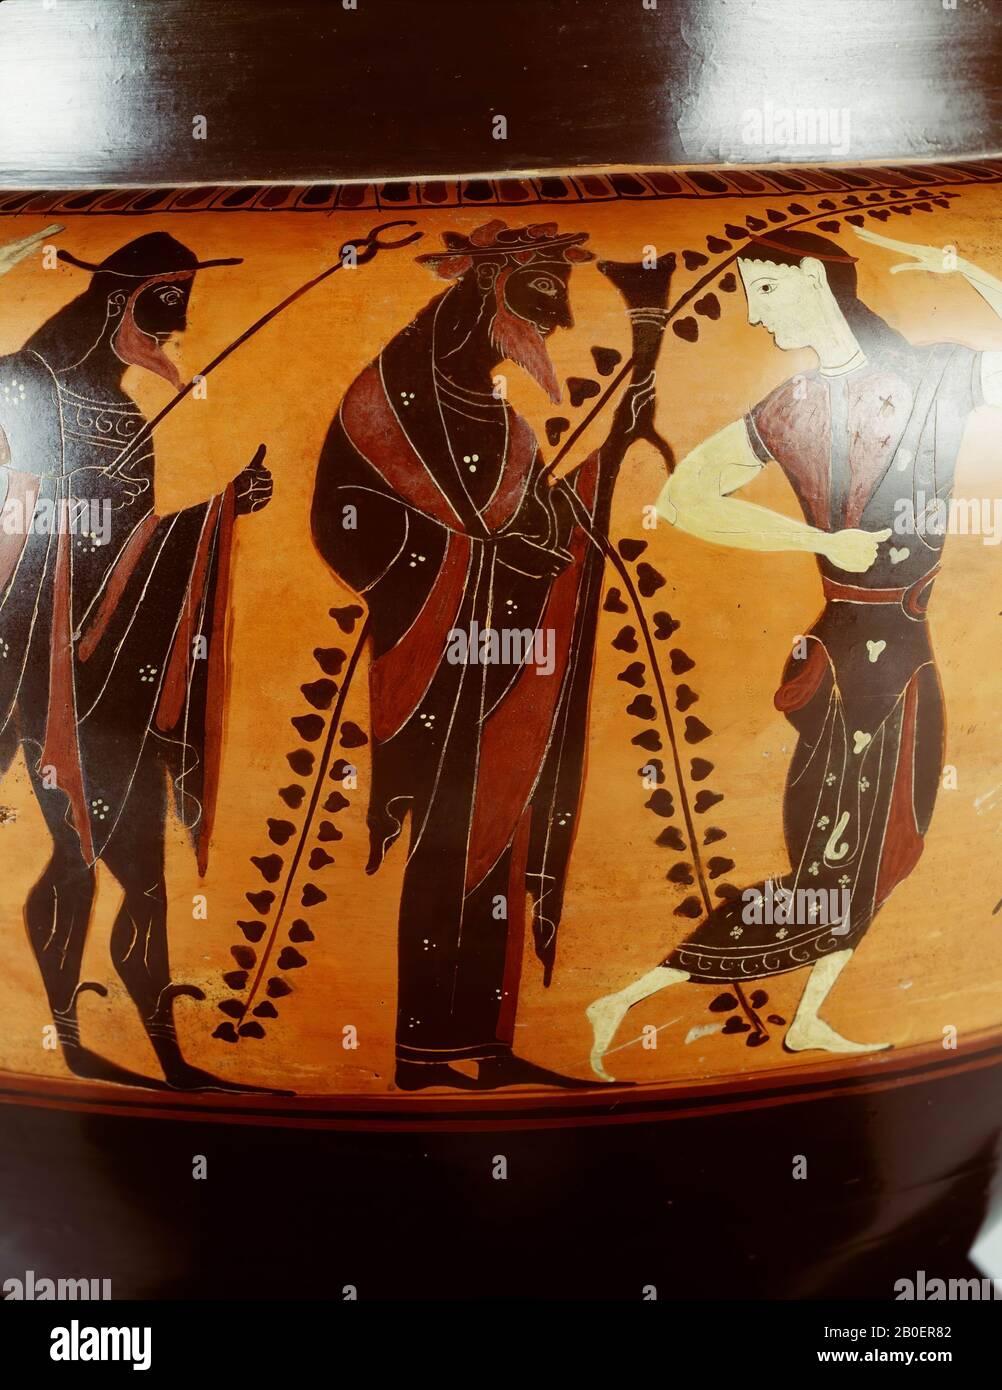 Athena Painter Immagini E Fotos Stock Alamy